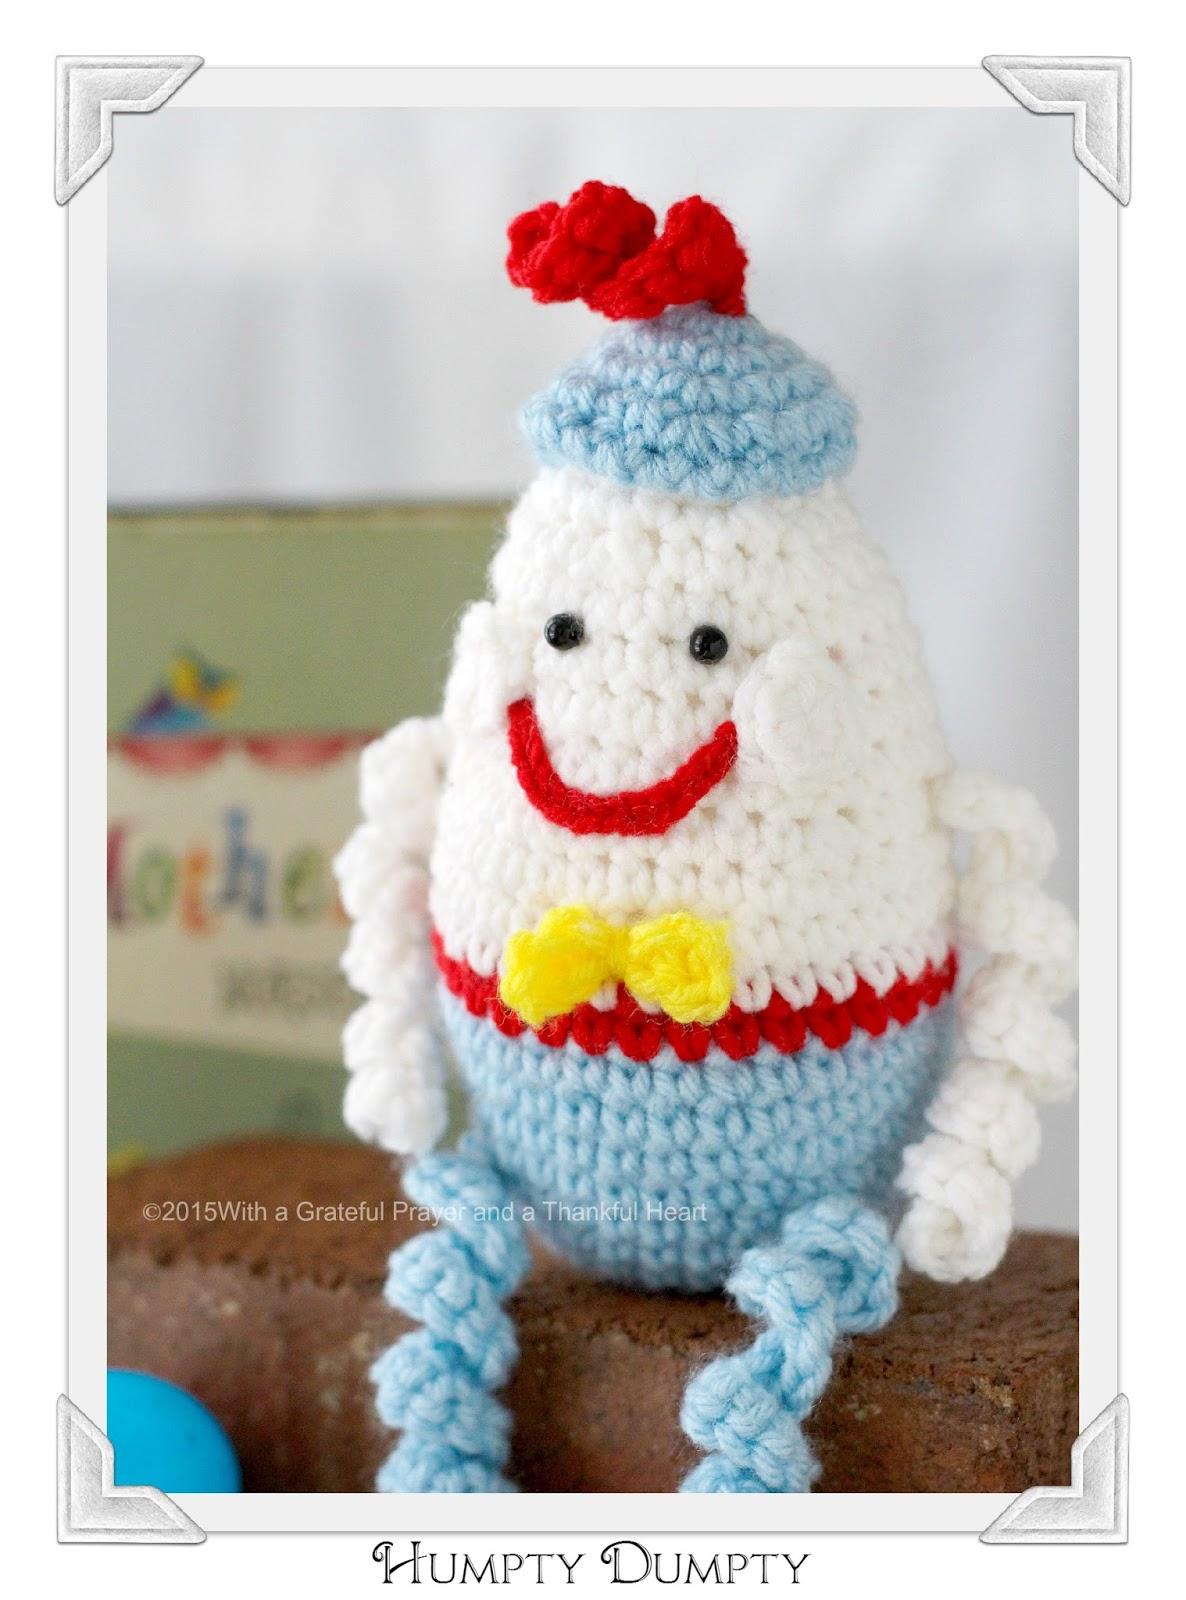 Free Humpty Dumpty Knitting Pattern : Crochet Pattern Humpty Dumpty images